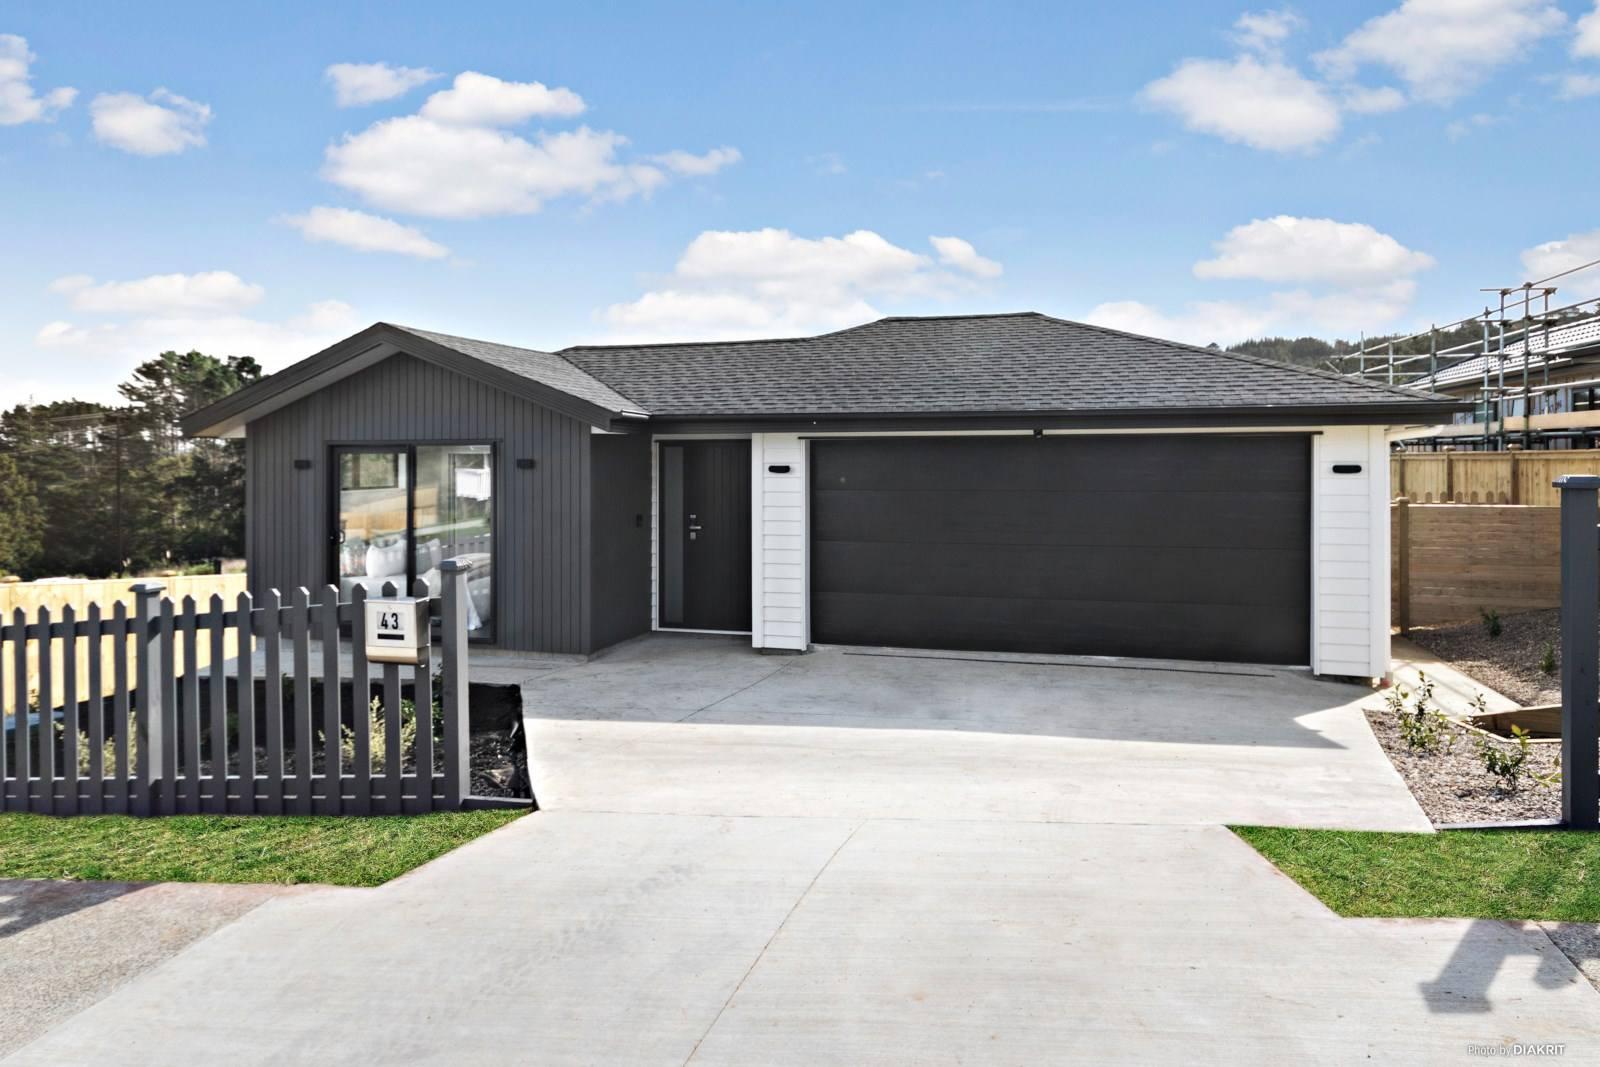 Kumeu 4房 全新品质美墅 10年质保加持 设计独特吸睛 好校云集 轻松前往CBD! Brand New & Solid Home